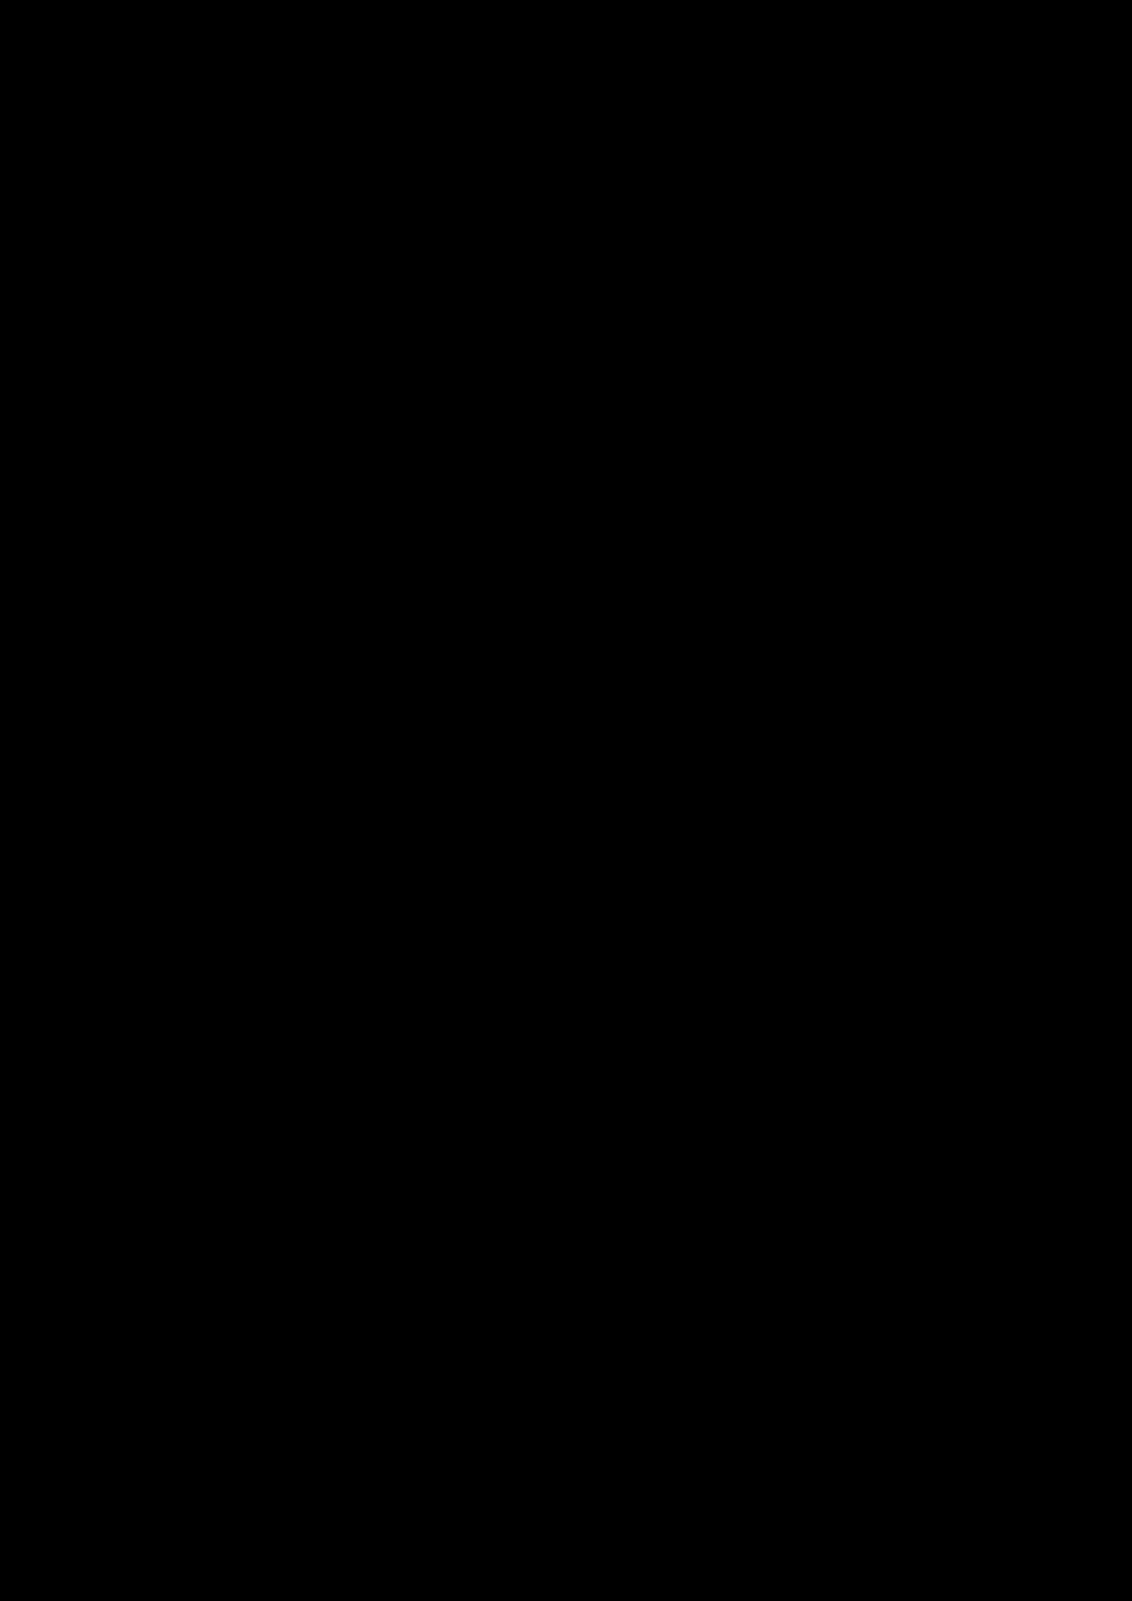 Korolevstvo slez slide, Image 84